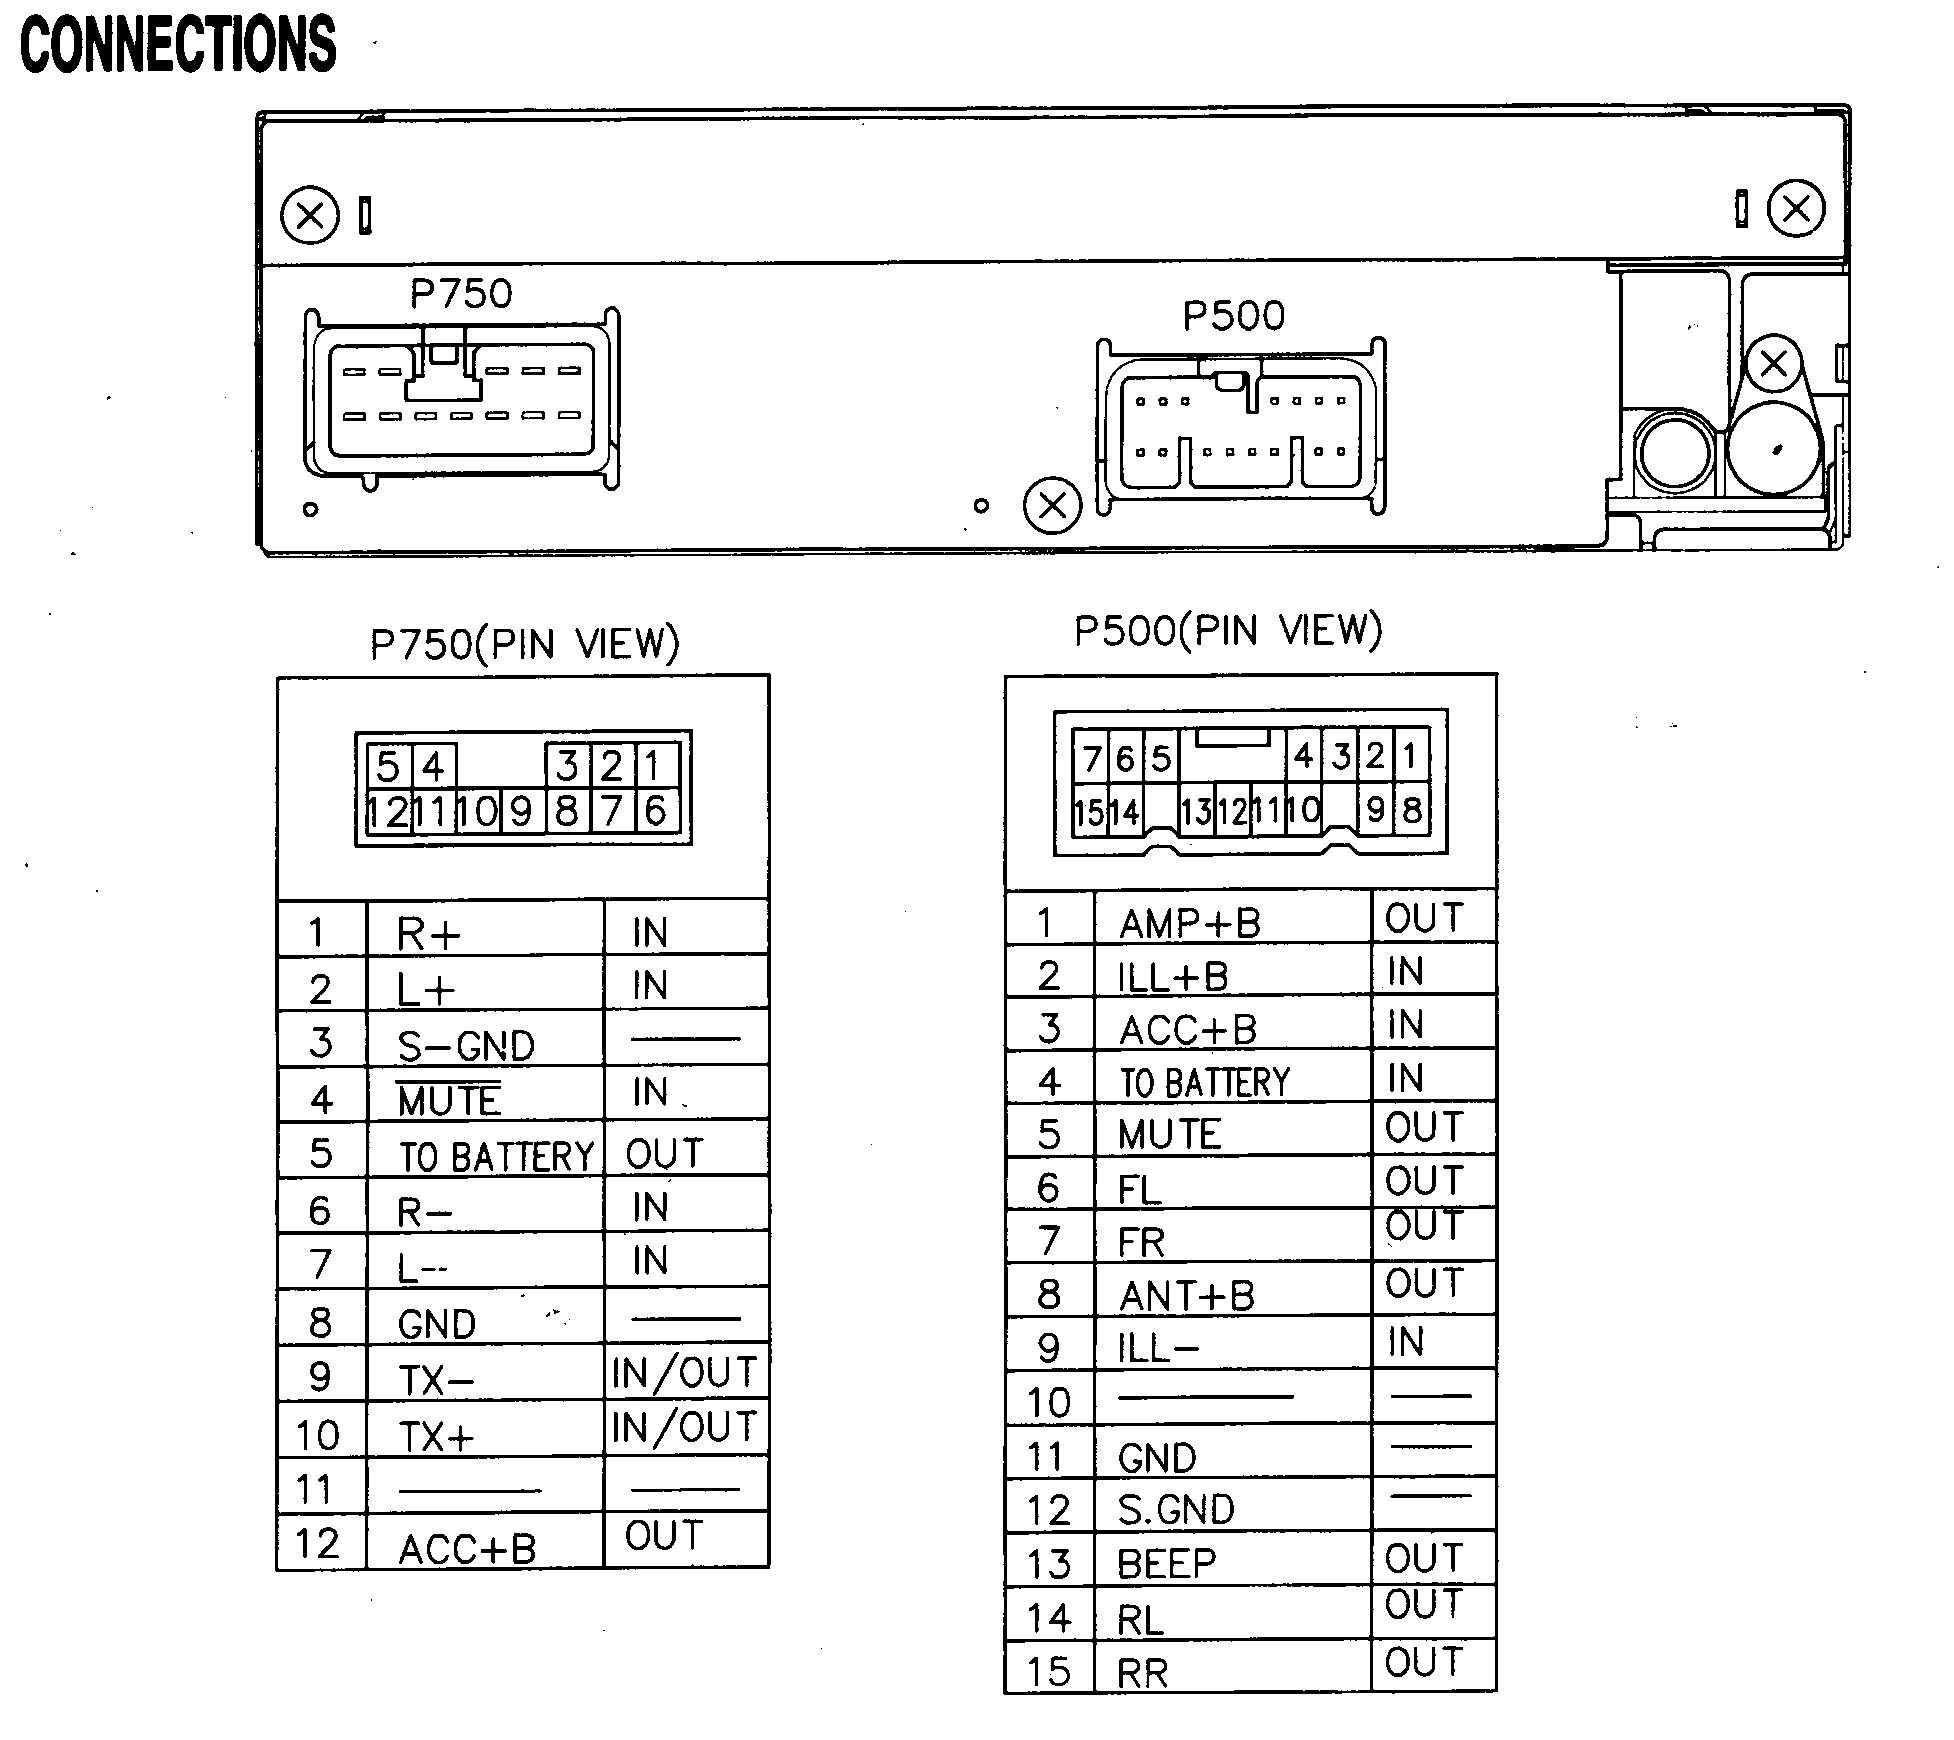 1991 Honda Accord Radio Wiring Diagram Car Amplifier Car Stereo Electrical Wiring Diagram